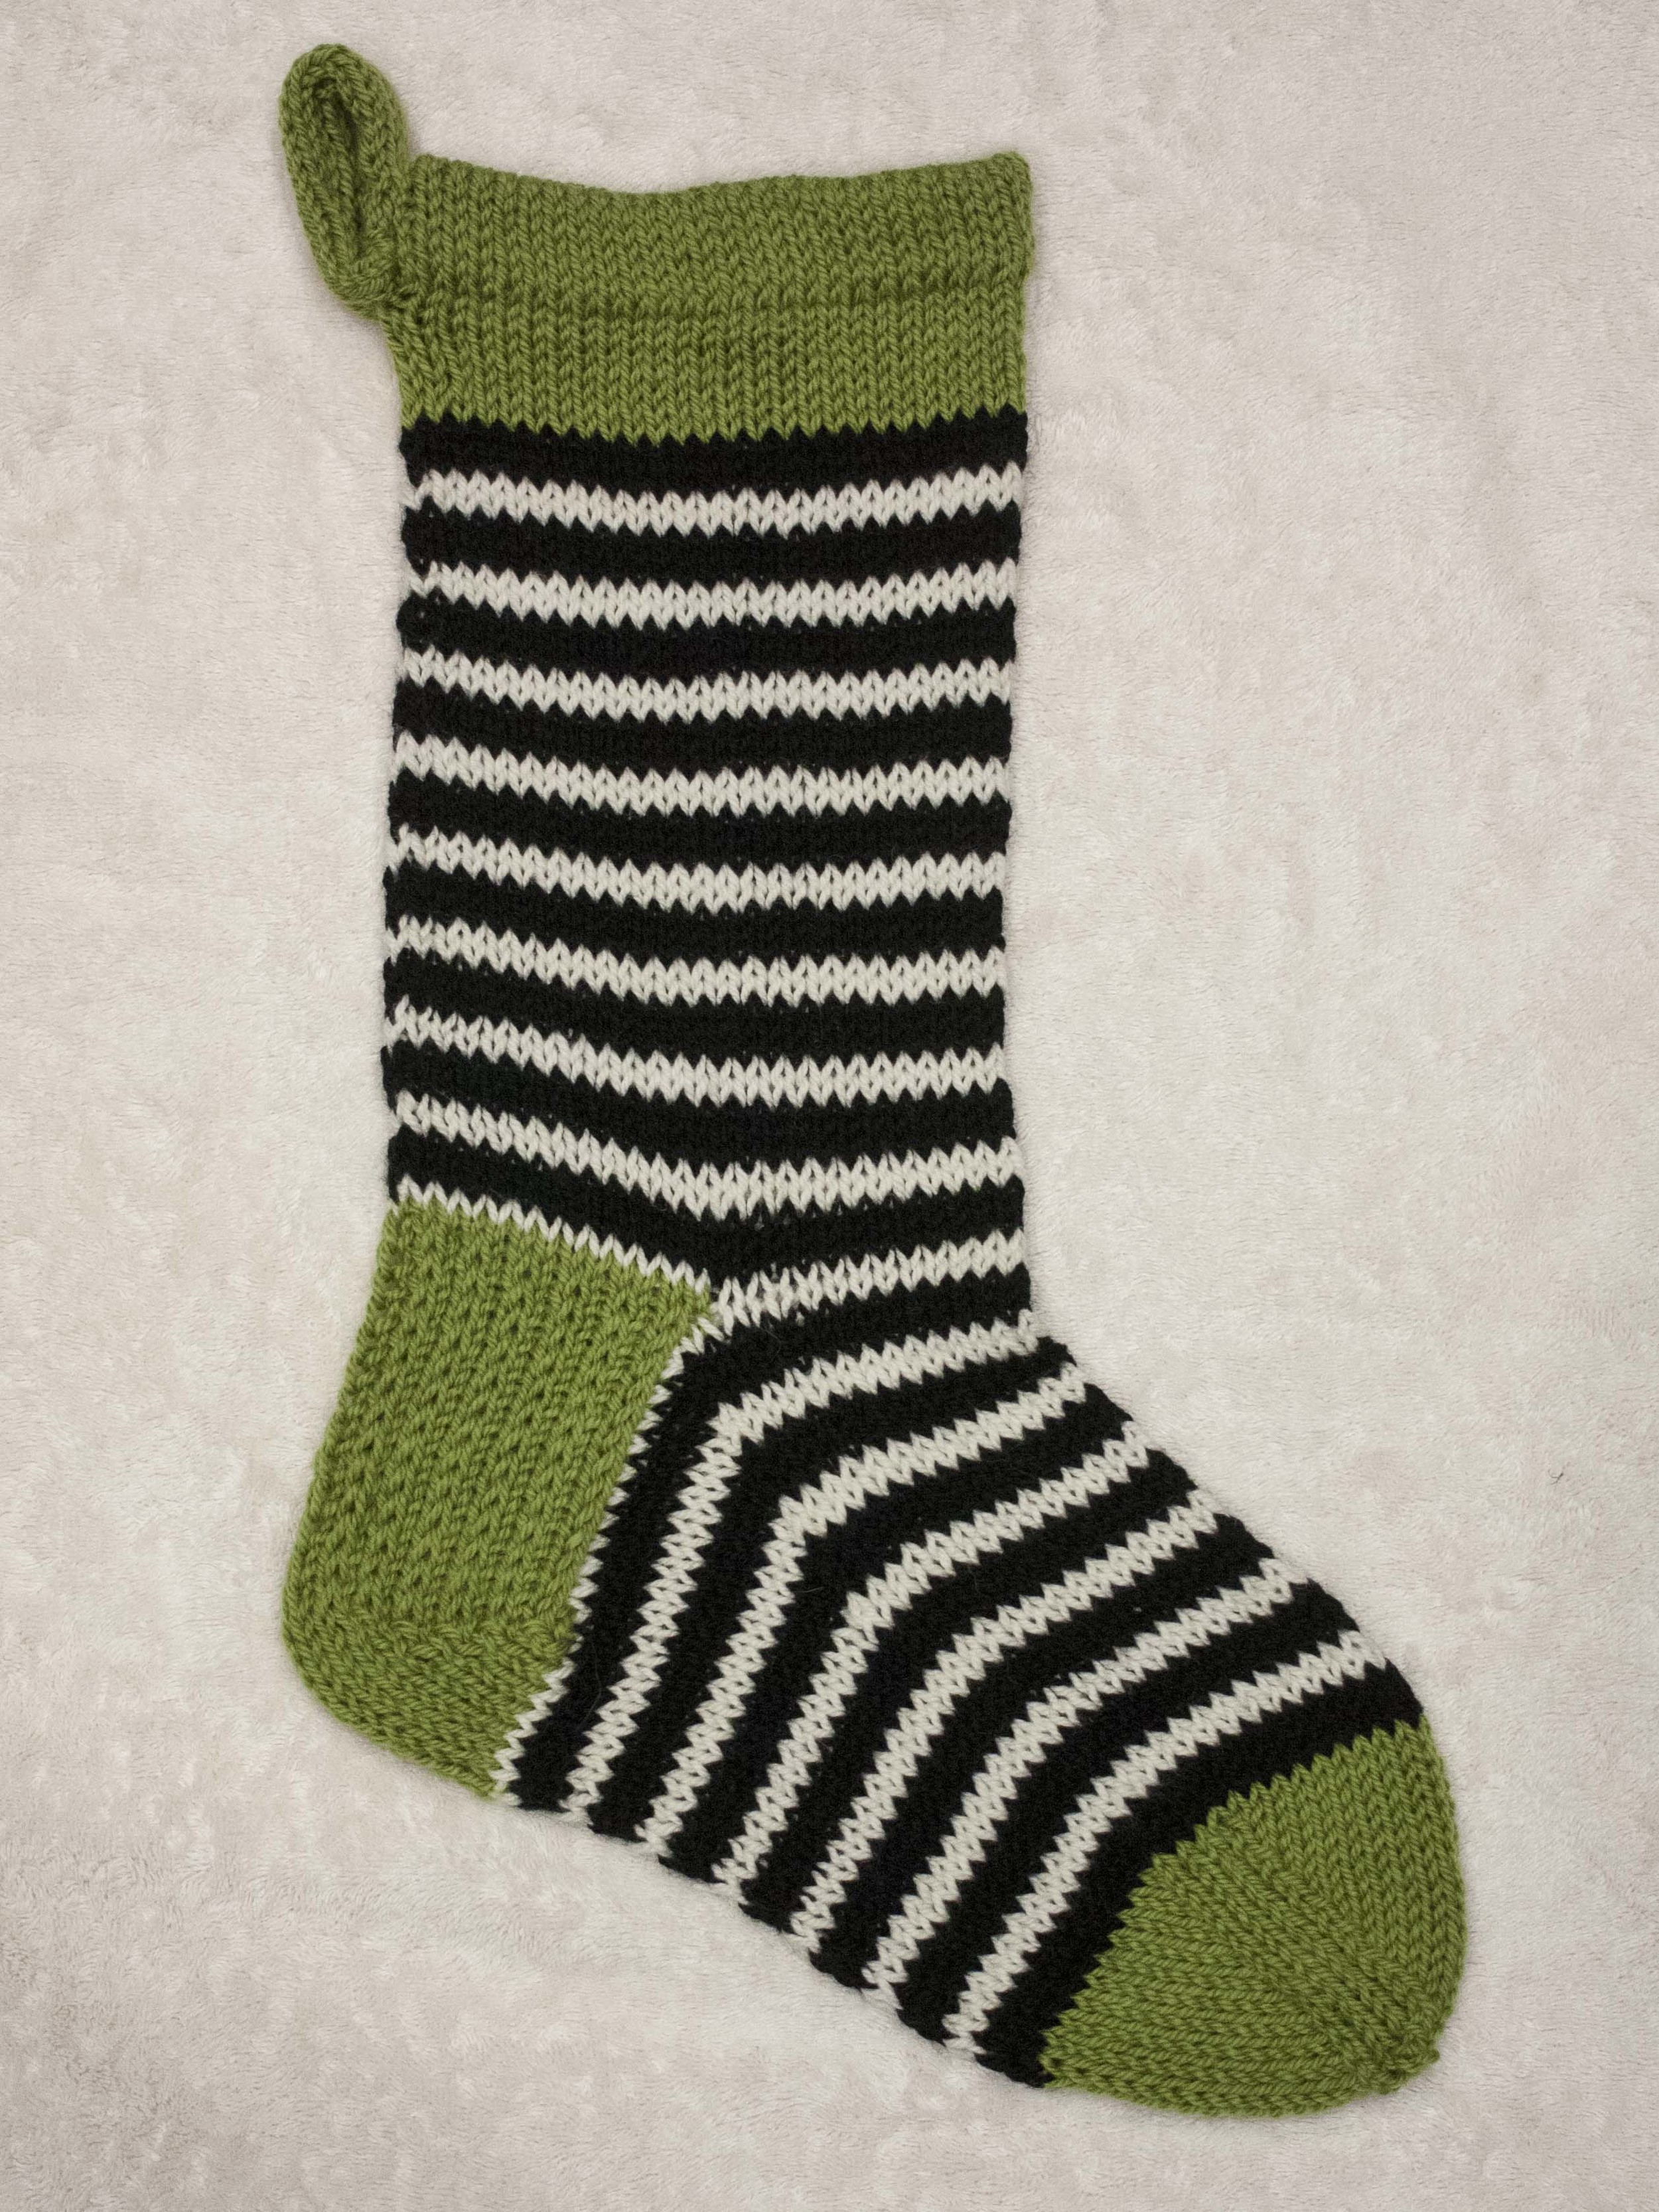 blocking hand knits